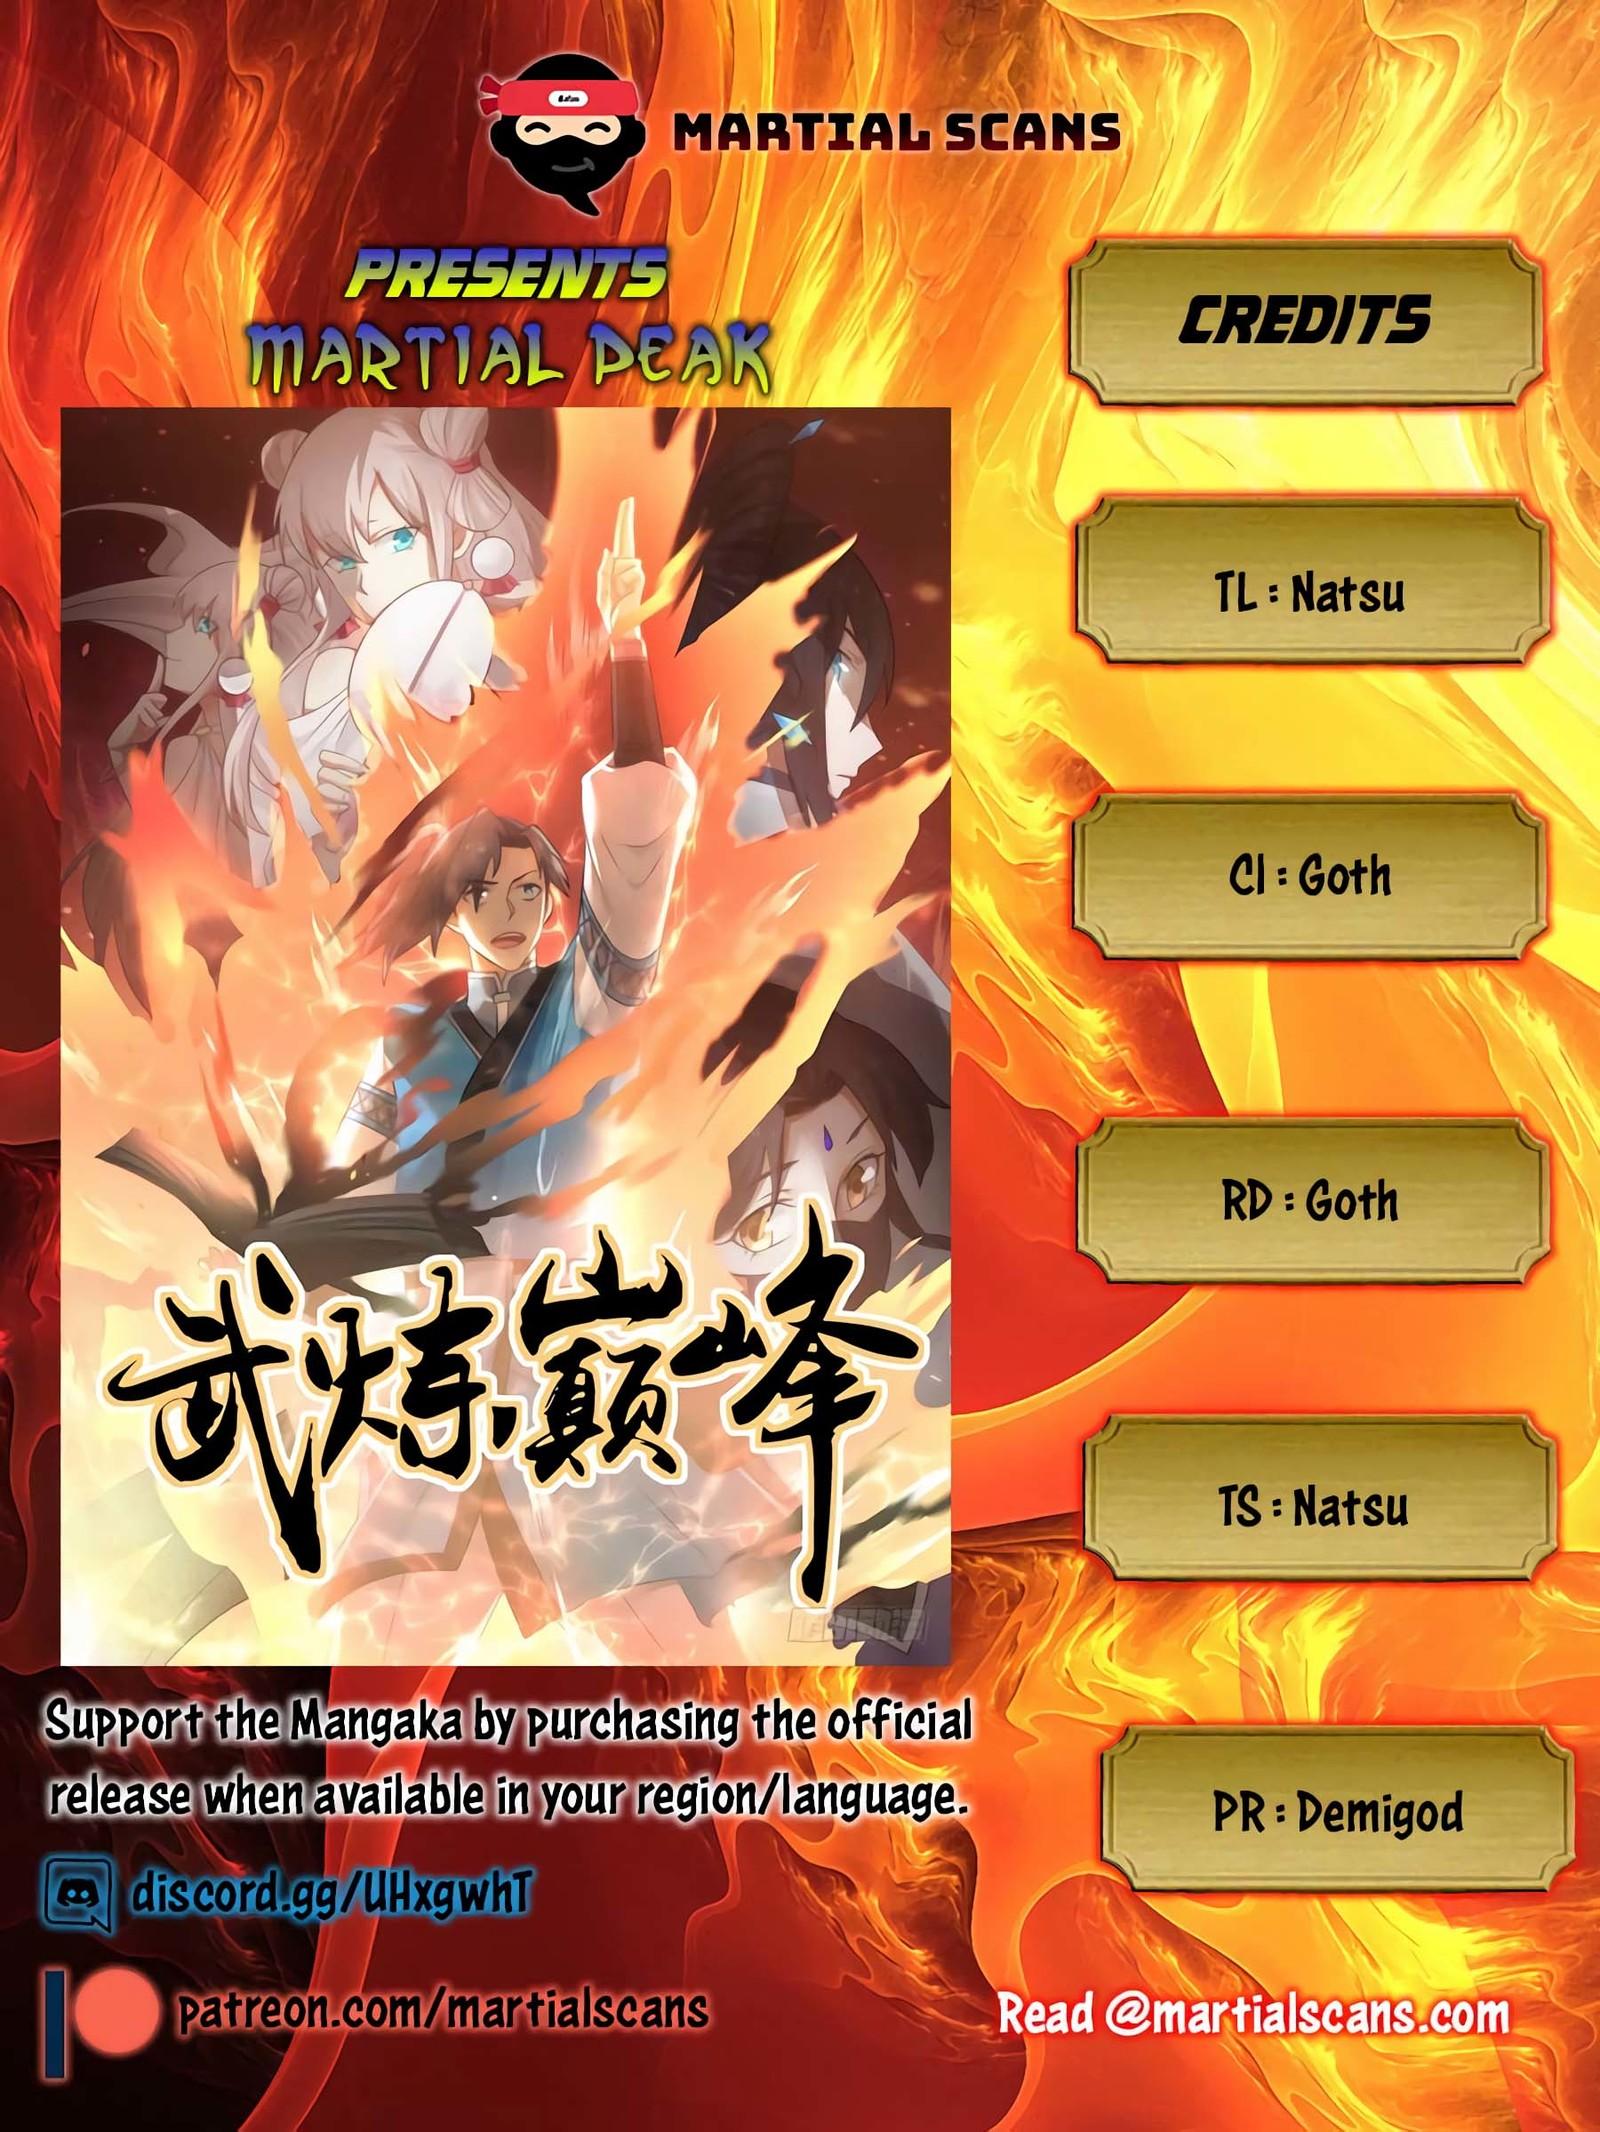 https://manga.mangadogs.com/comics/pic4/17/21329/2585755/bc3d0a0a0c442470e57c86c1b2ec1423.jpg Page 1